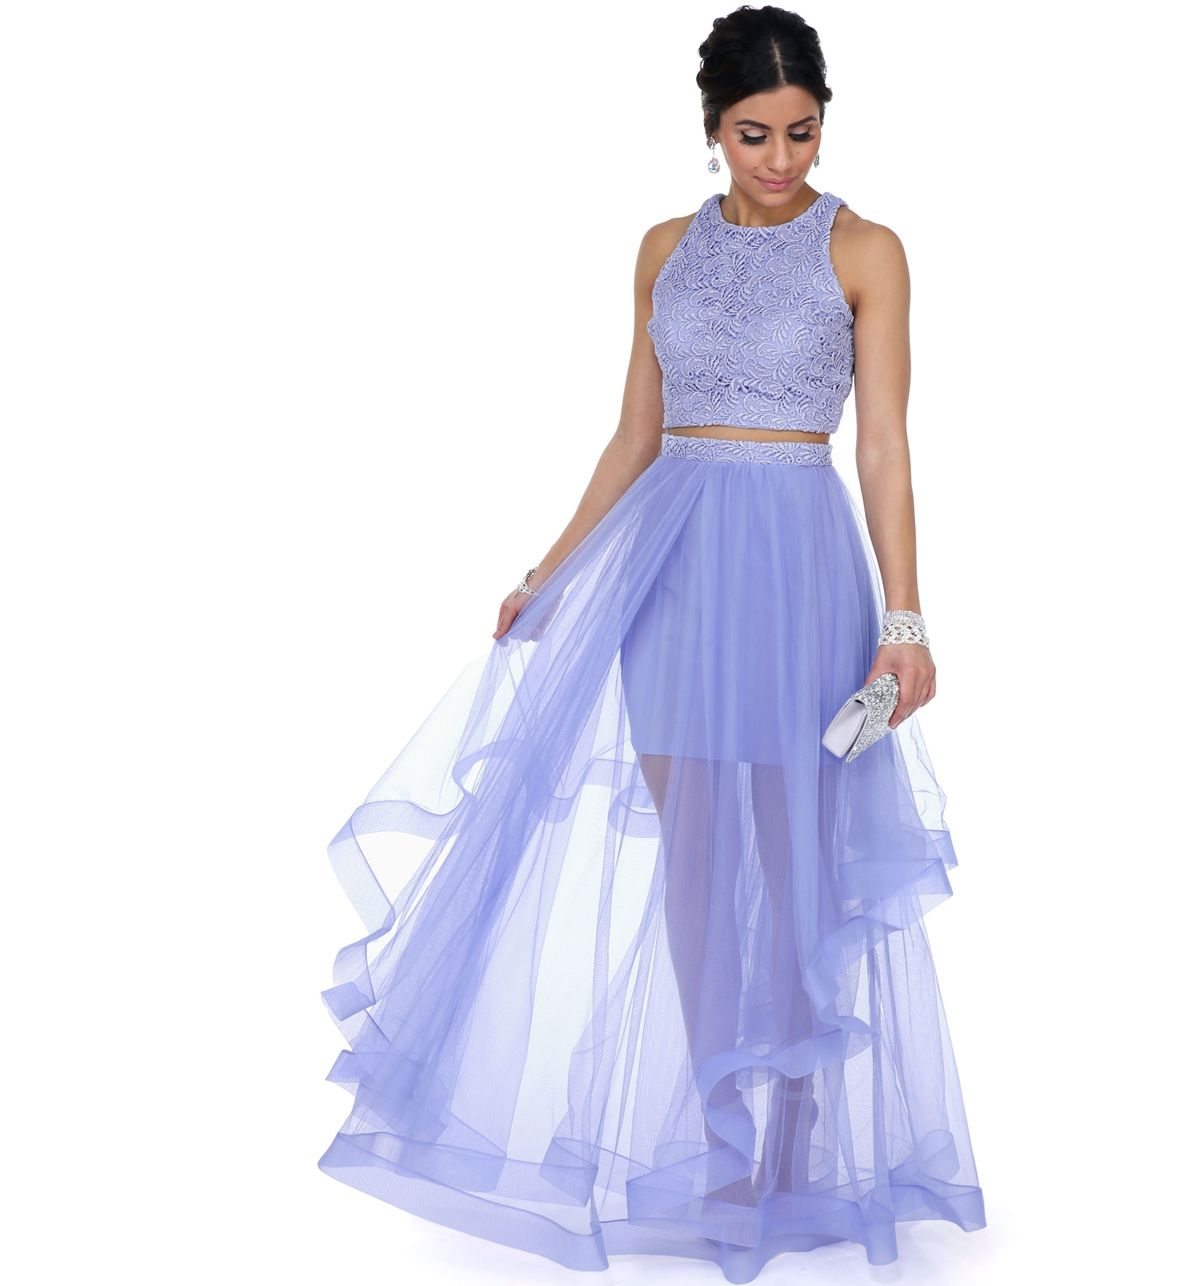 Camila Lavender Two Piece Prom Dress Lavender Prom Dresses Prom Dresses Piece Prom Dress [ 1286 x 1180 Pixel ]